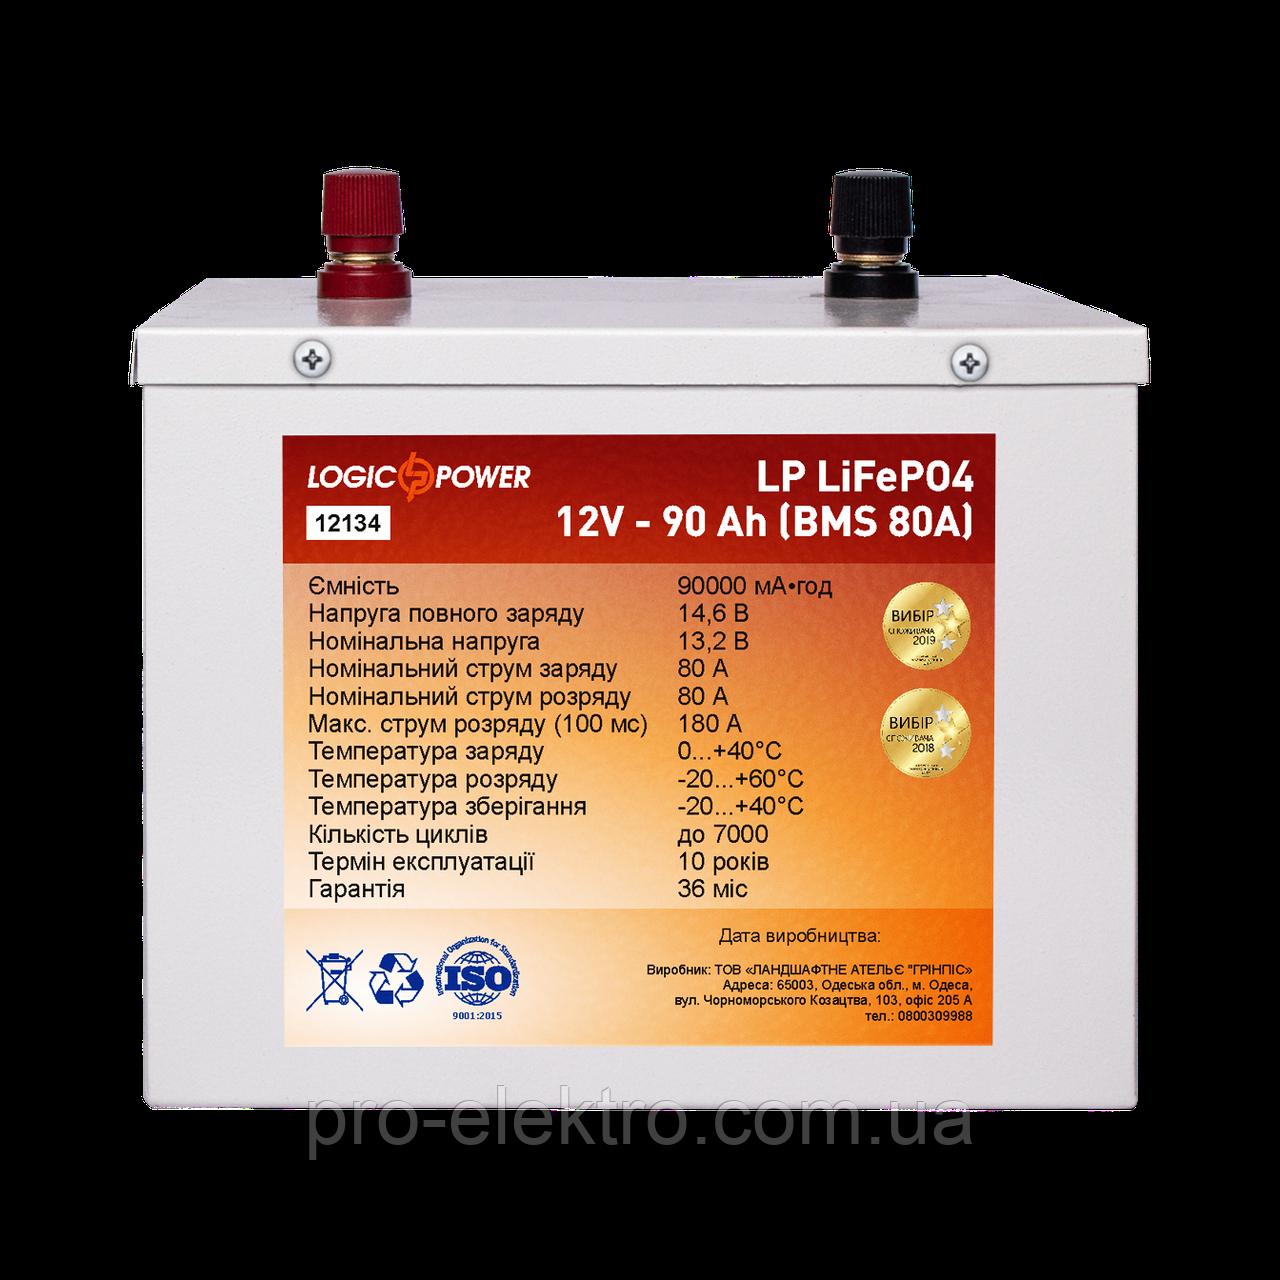 Аккумулятор LP LiFePO4 12V - 90 Ah (BMS 80A) металл